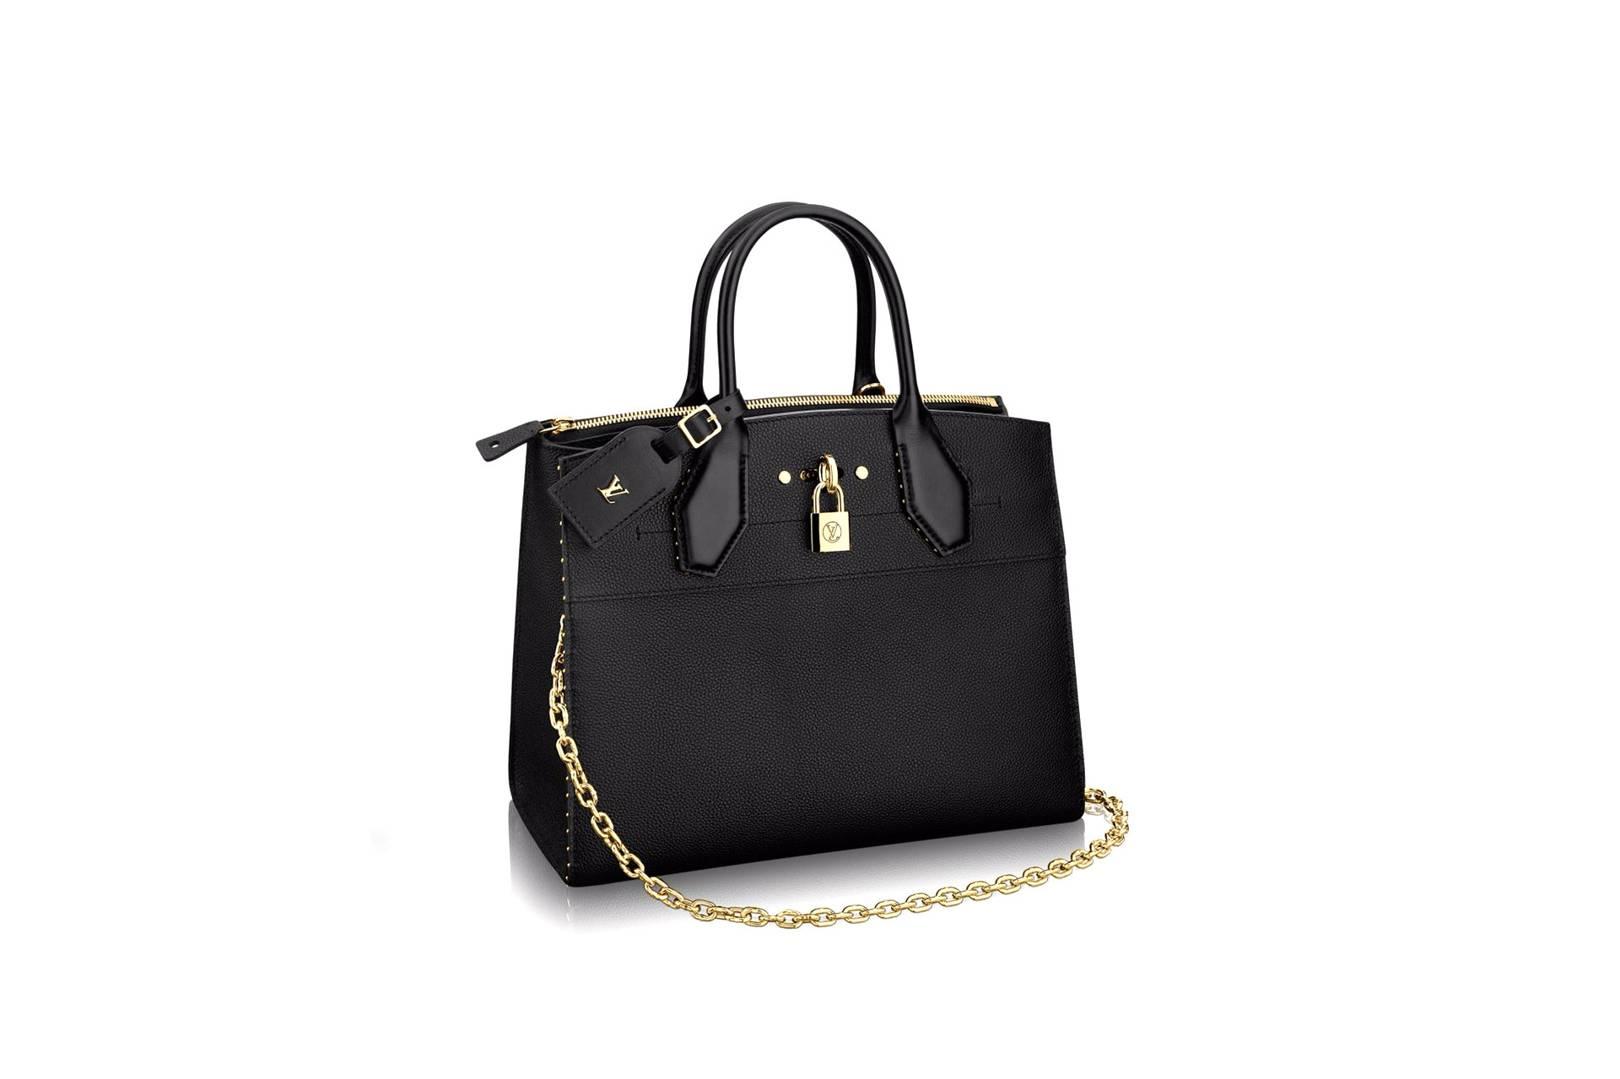 Top 10 Luxury Bags Brands 2018